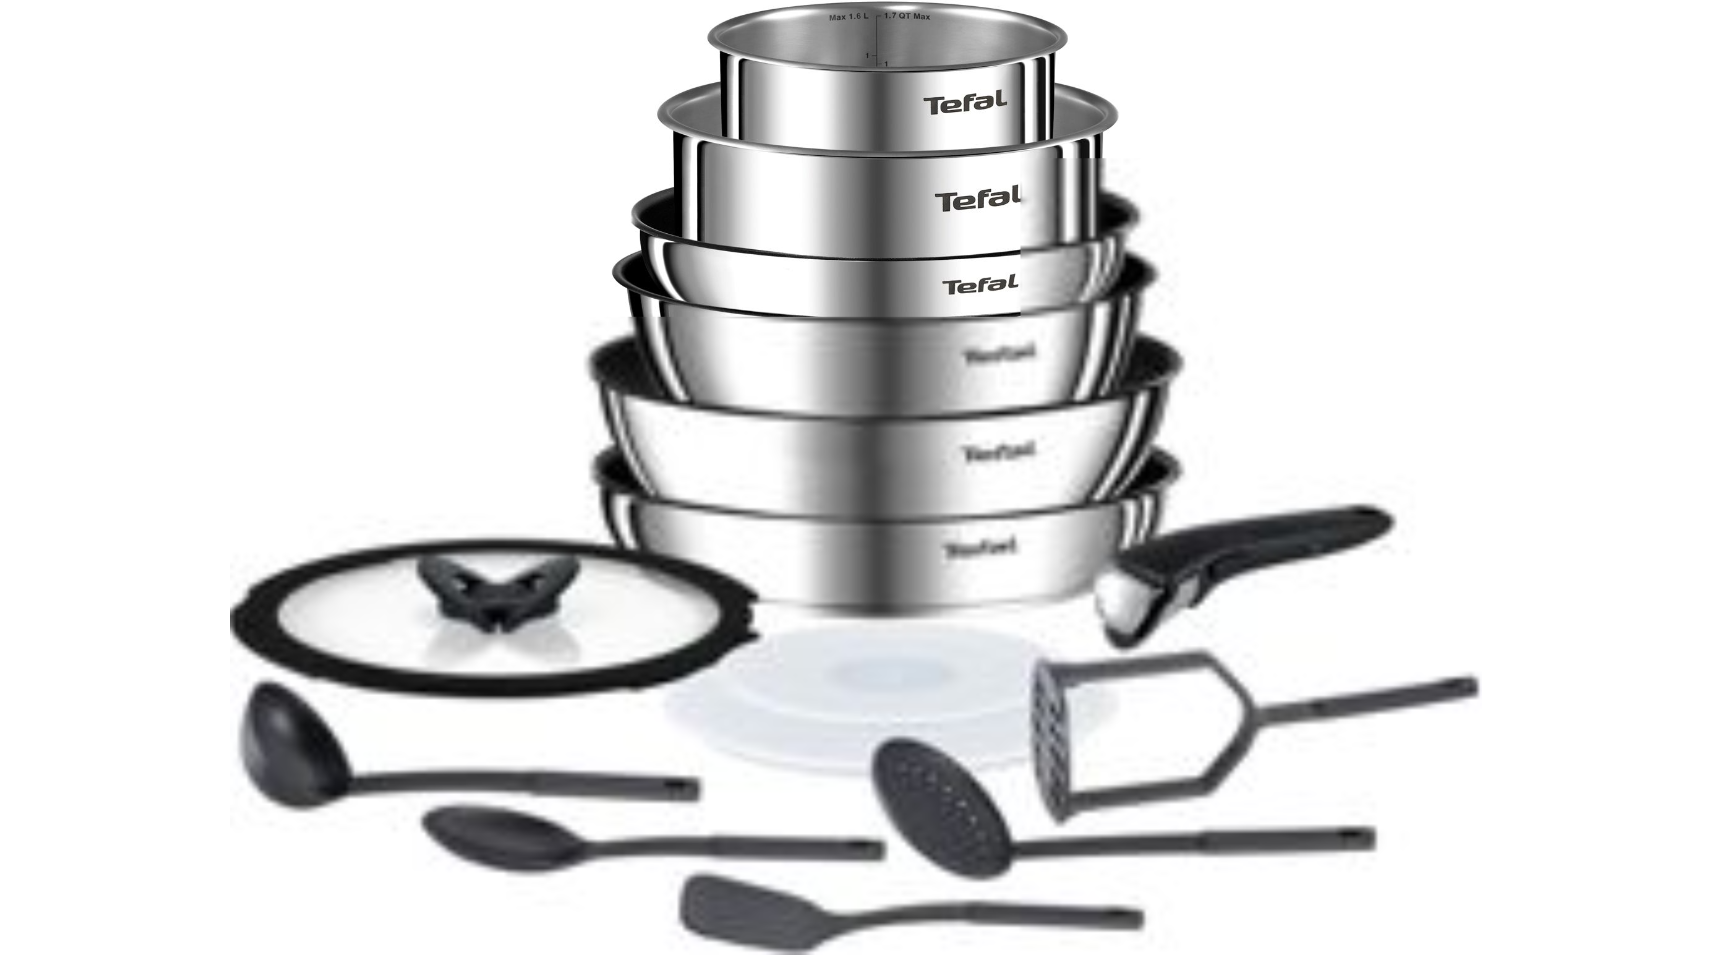 Soldes Batterie De Cuisine Tefal Ingenio Emotion Soldes